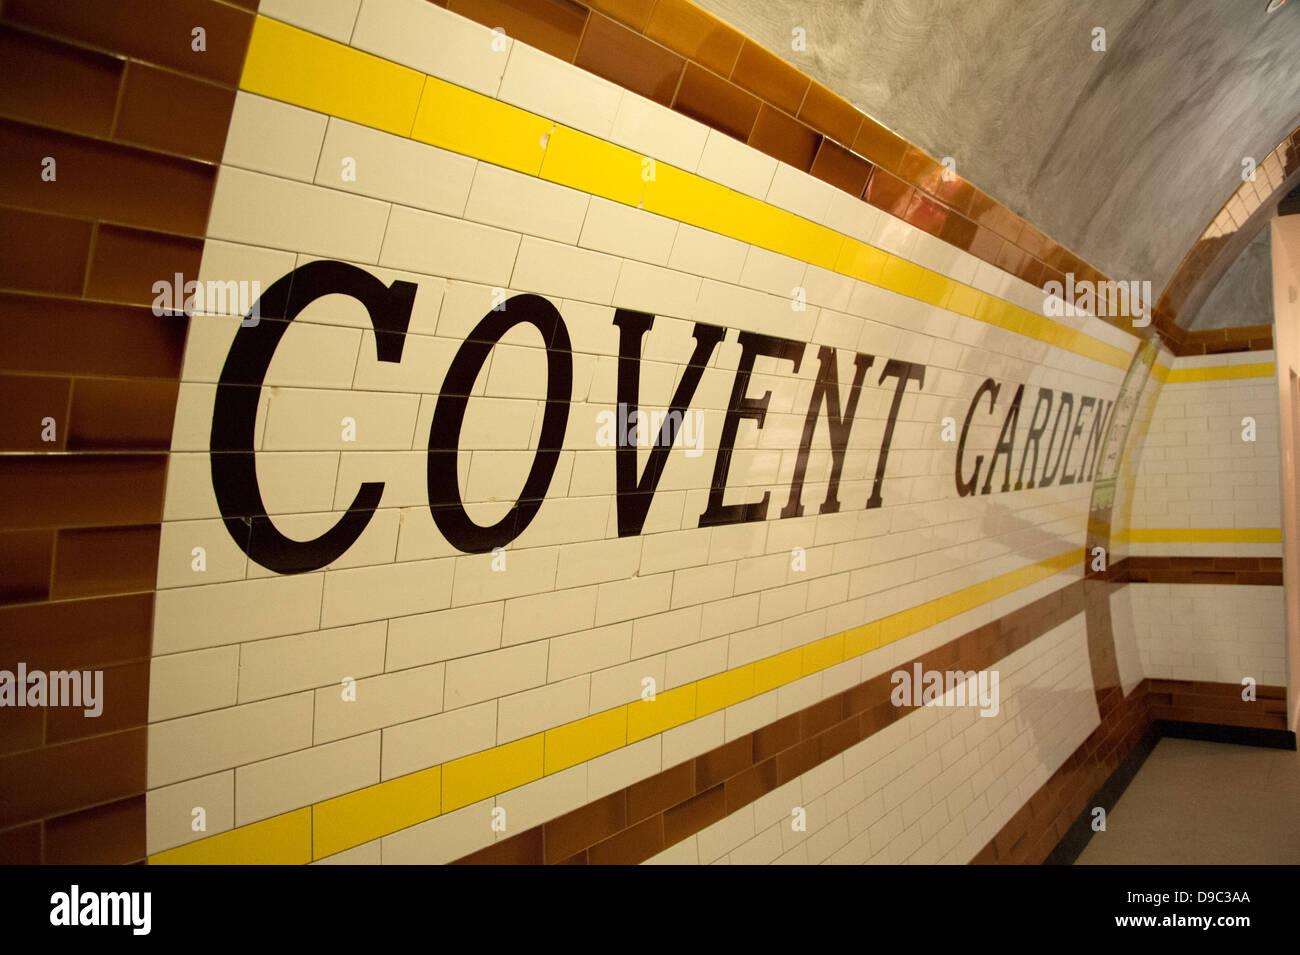 covent garden tube station fliesen